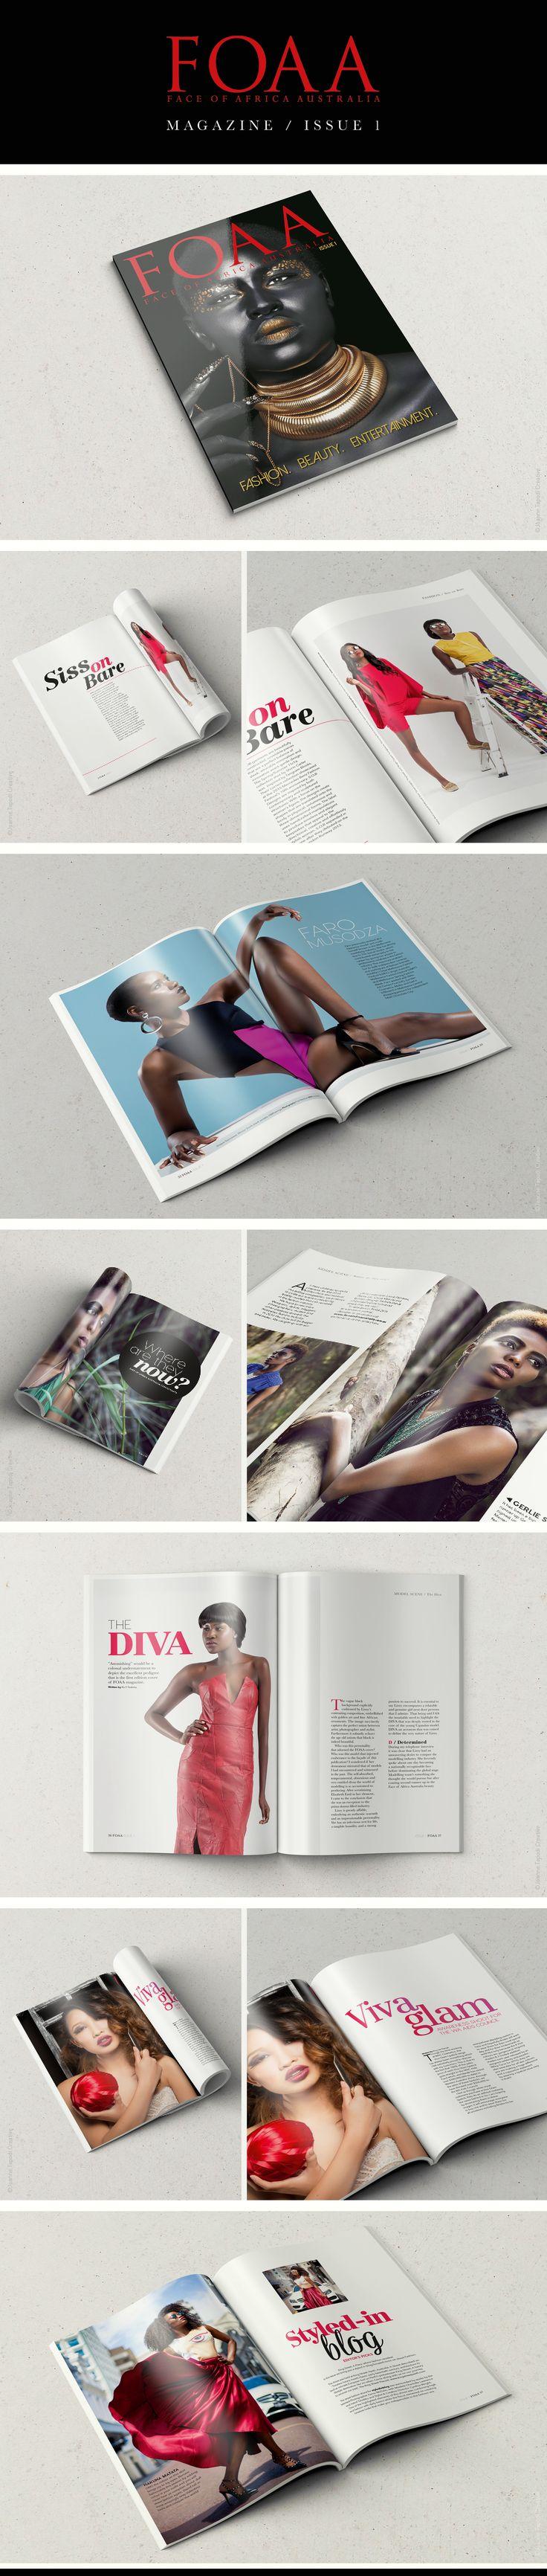 FOAA Magazine / editorial design by Joanne Tapodi Creative / magazine / layout / www.joannetapodicreative.com.au #graphicdesign #editorial #magazine #publishing #design